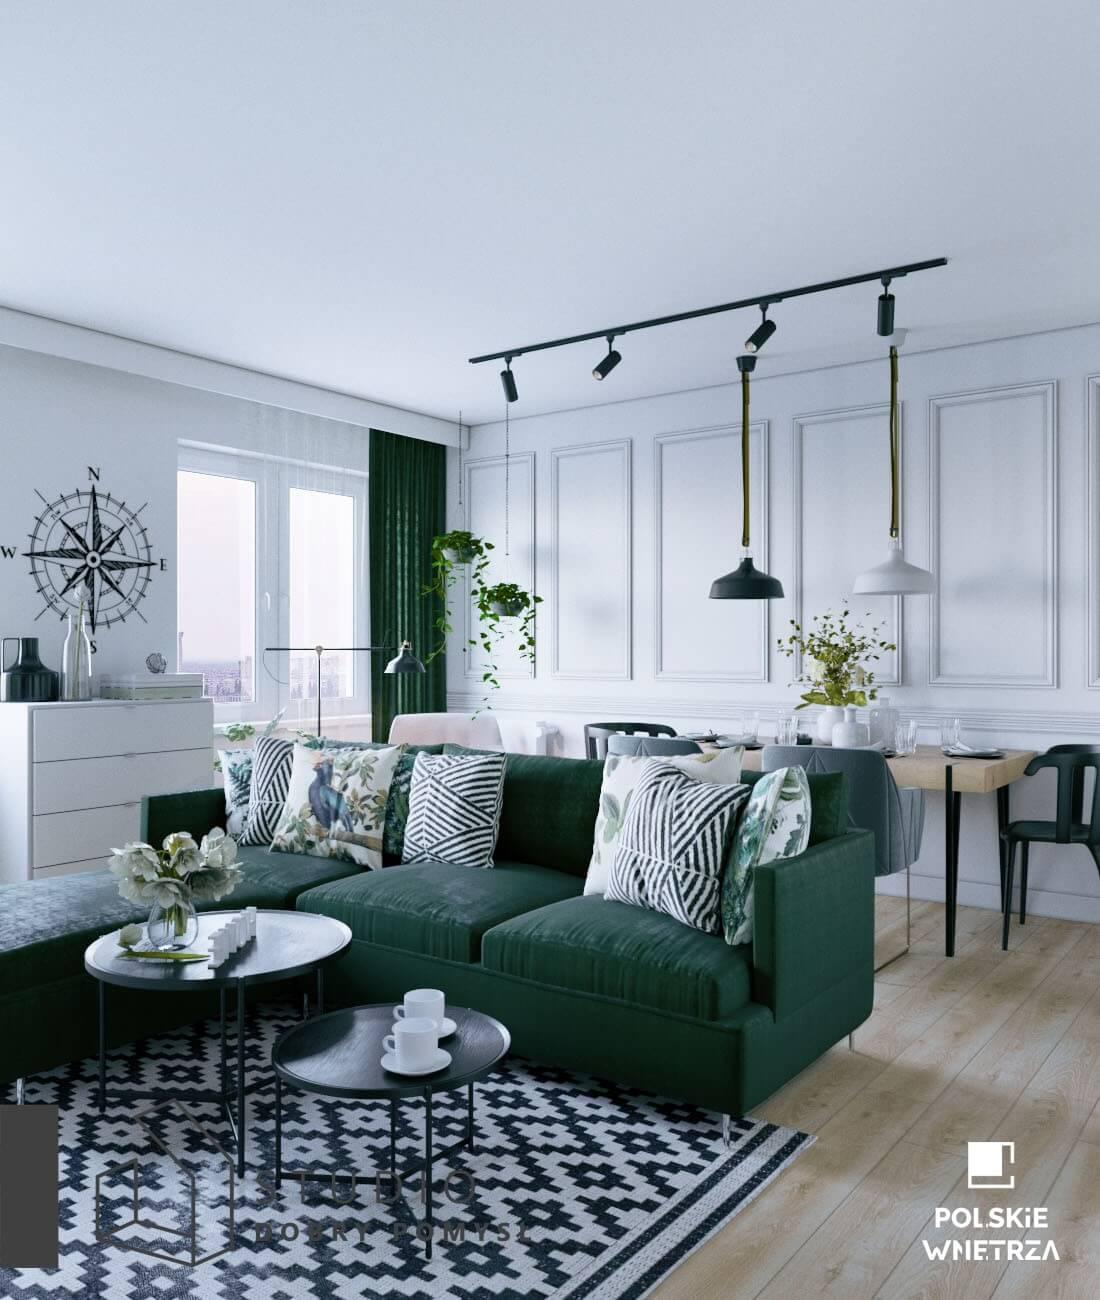 butelkowo zielona kanapa